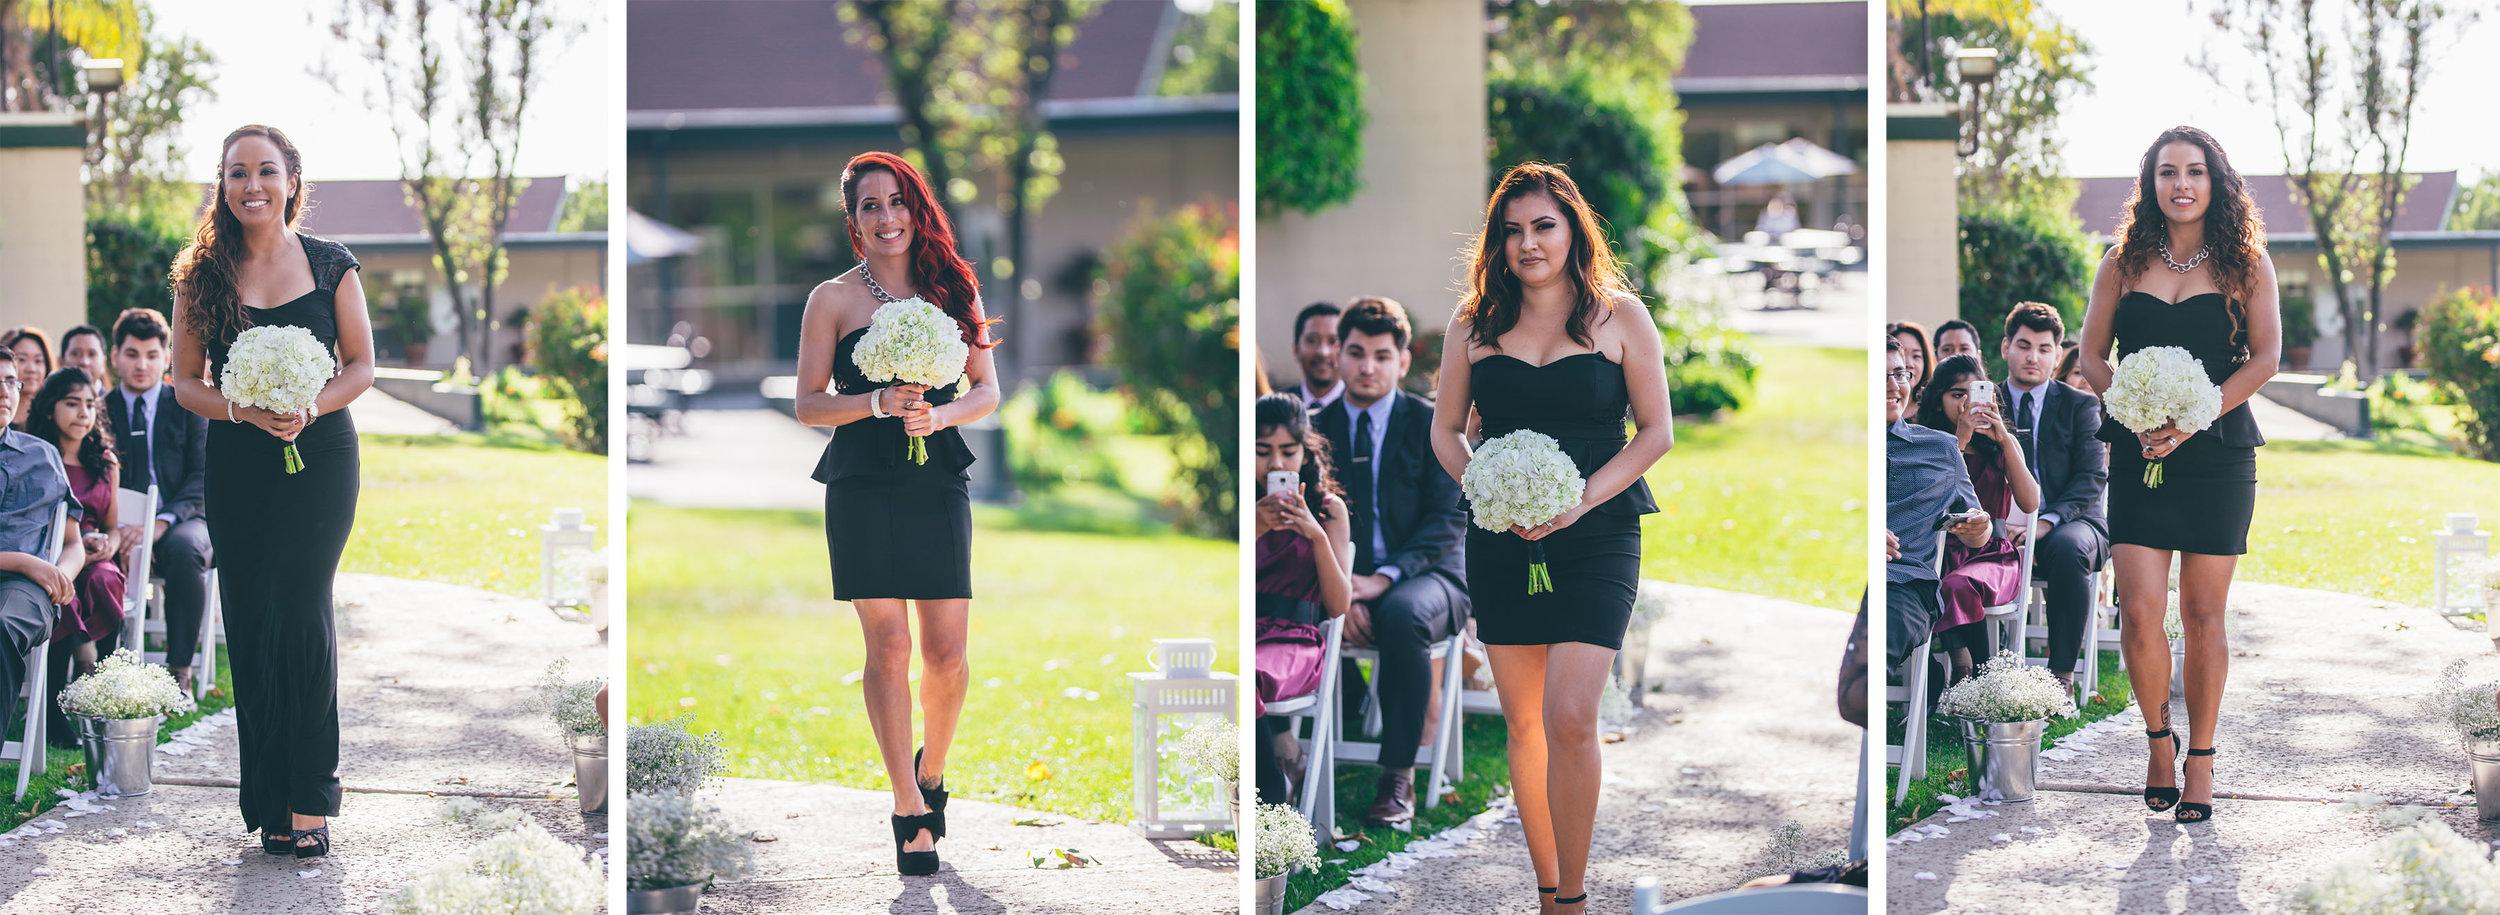 APavone-Photographer-Orange-County-Diamond-Bar-Wedding-02.jpg